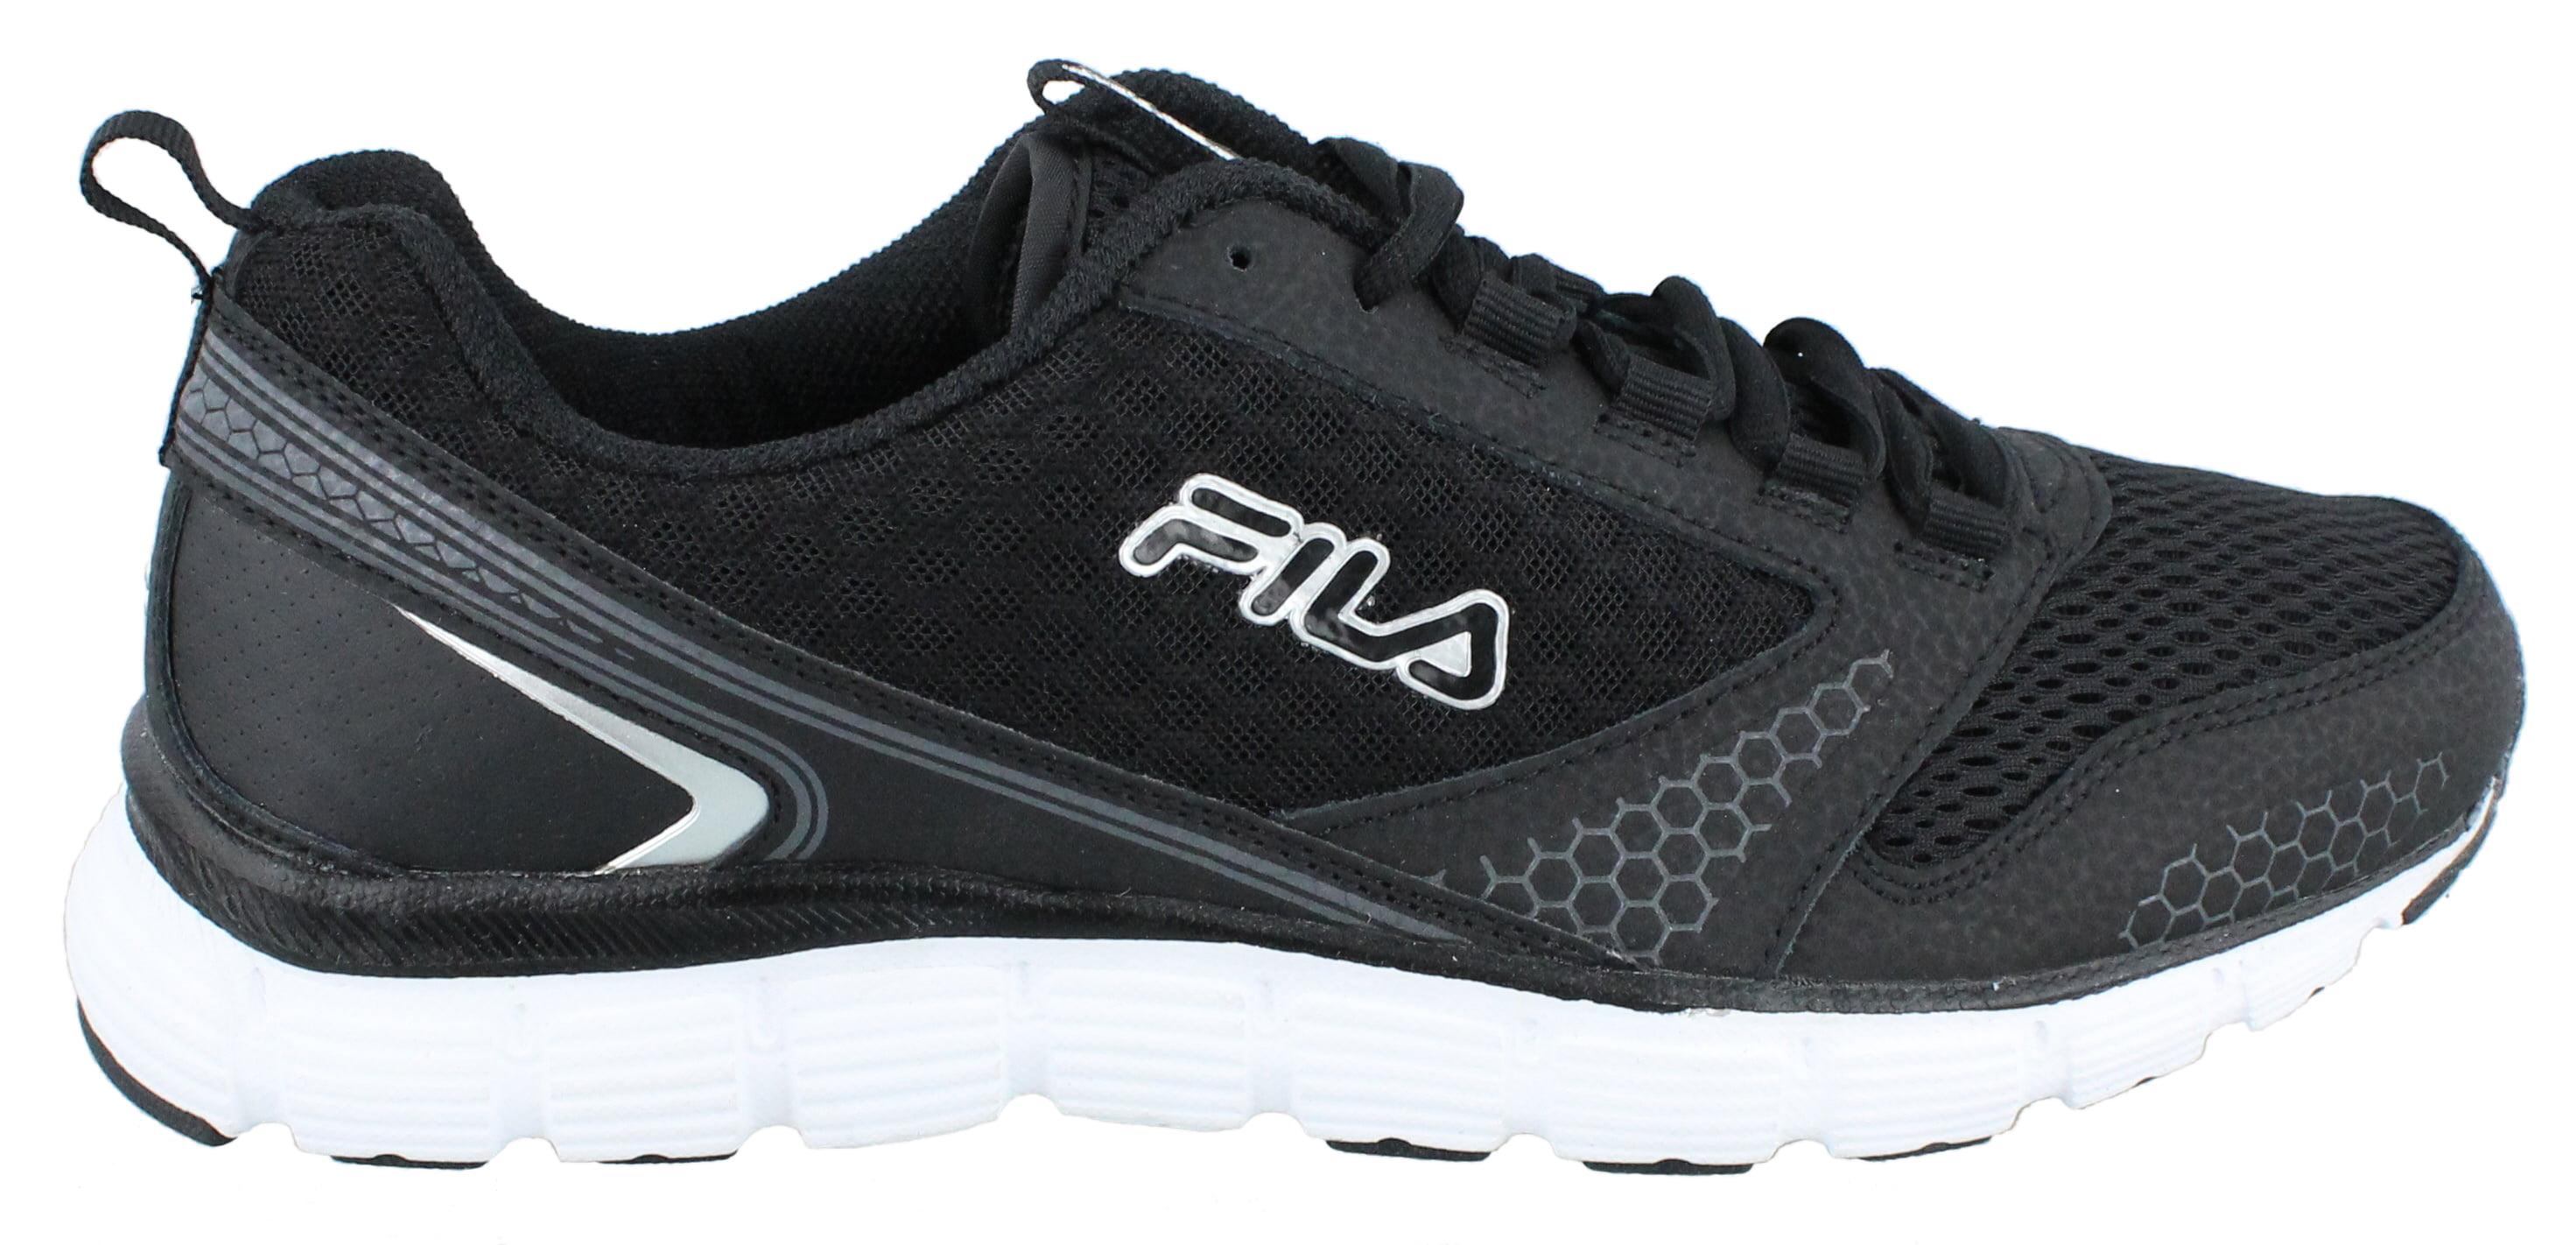 54b4942ca478 FILA - Men s Fila